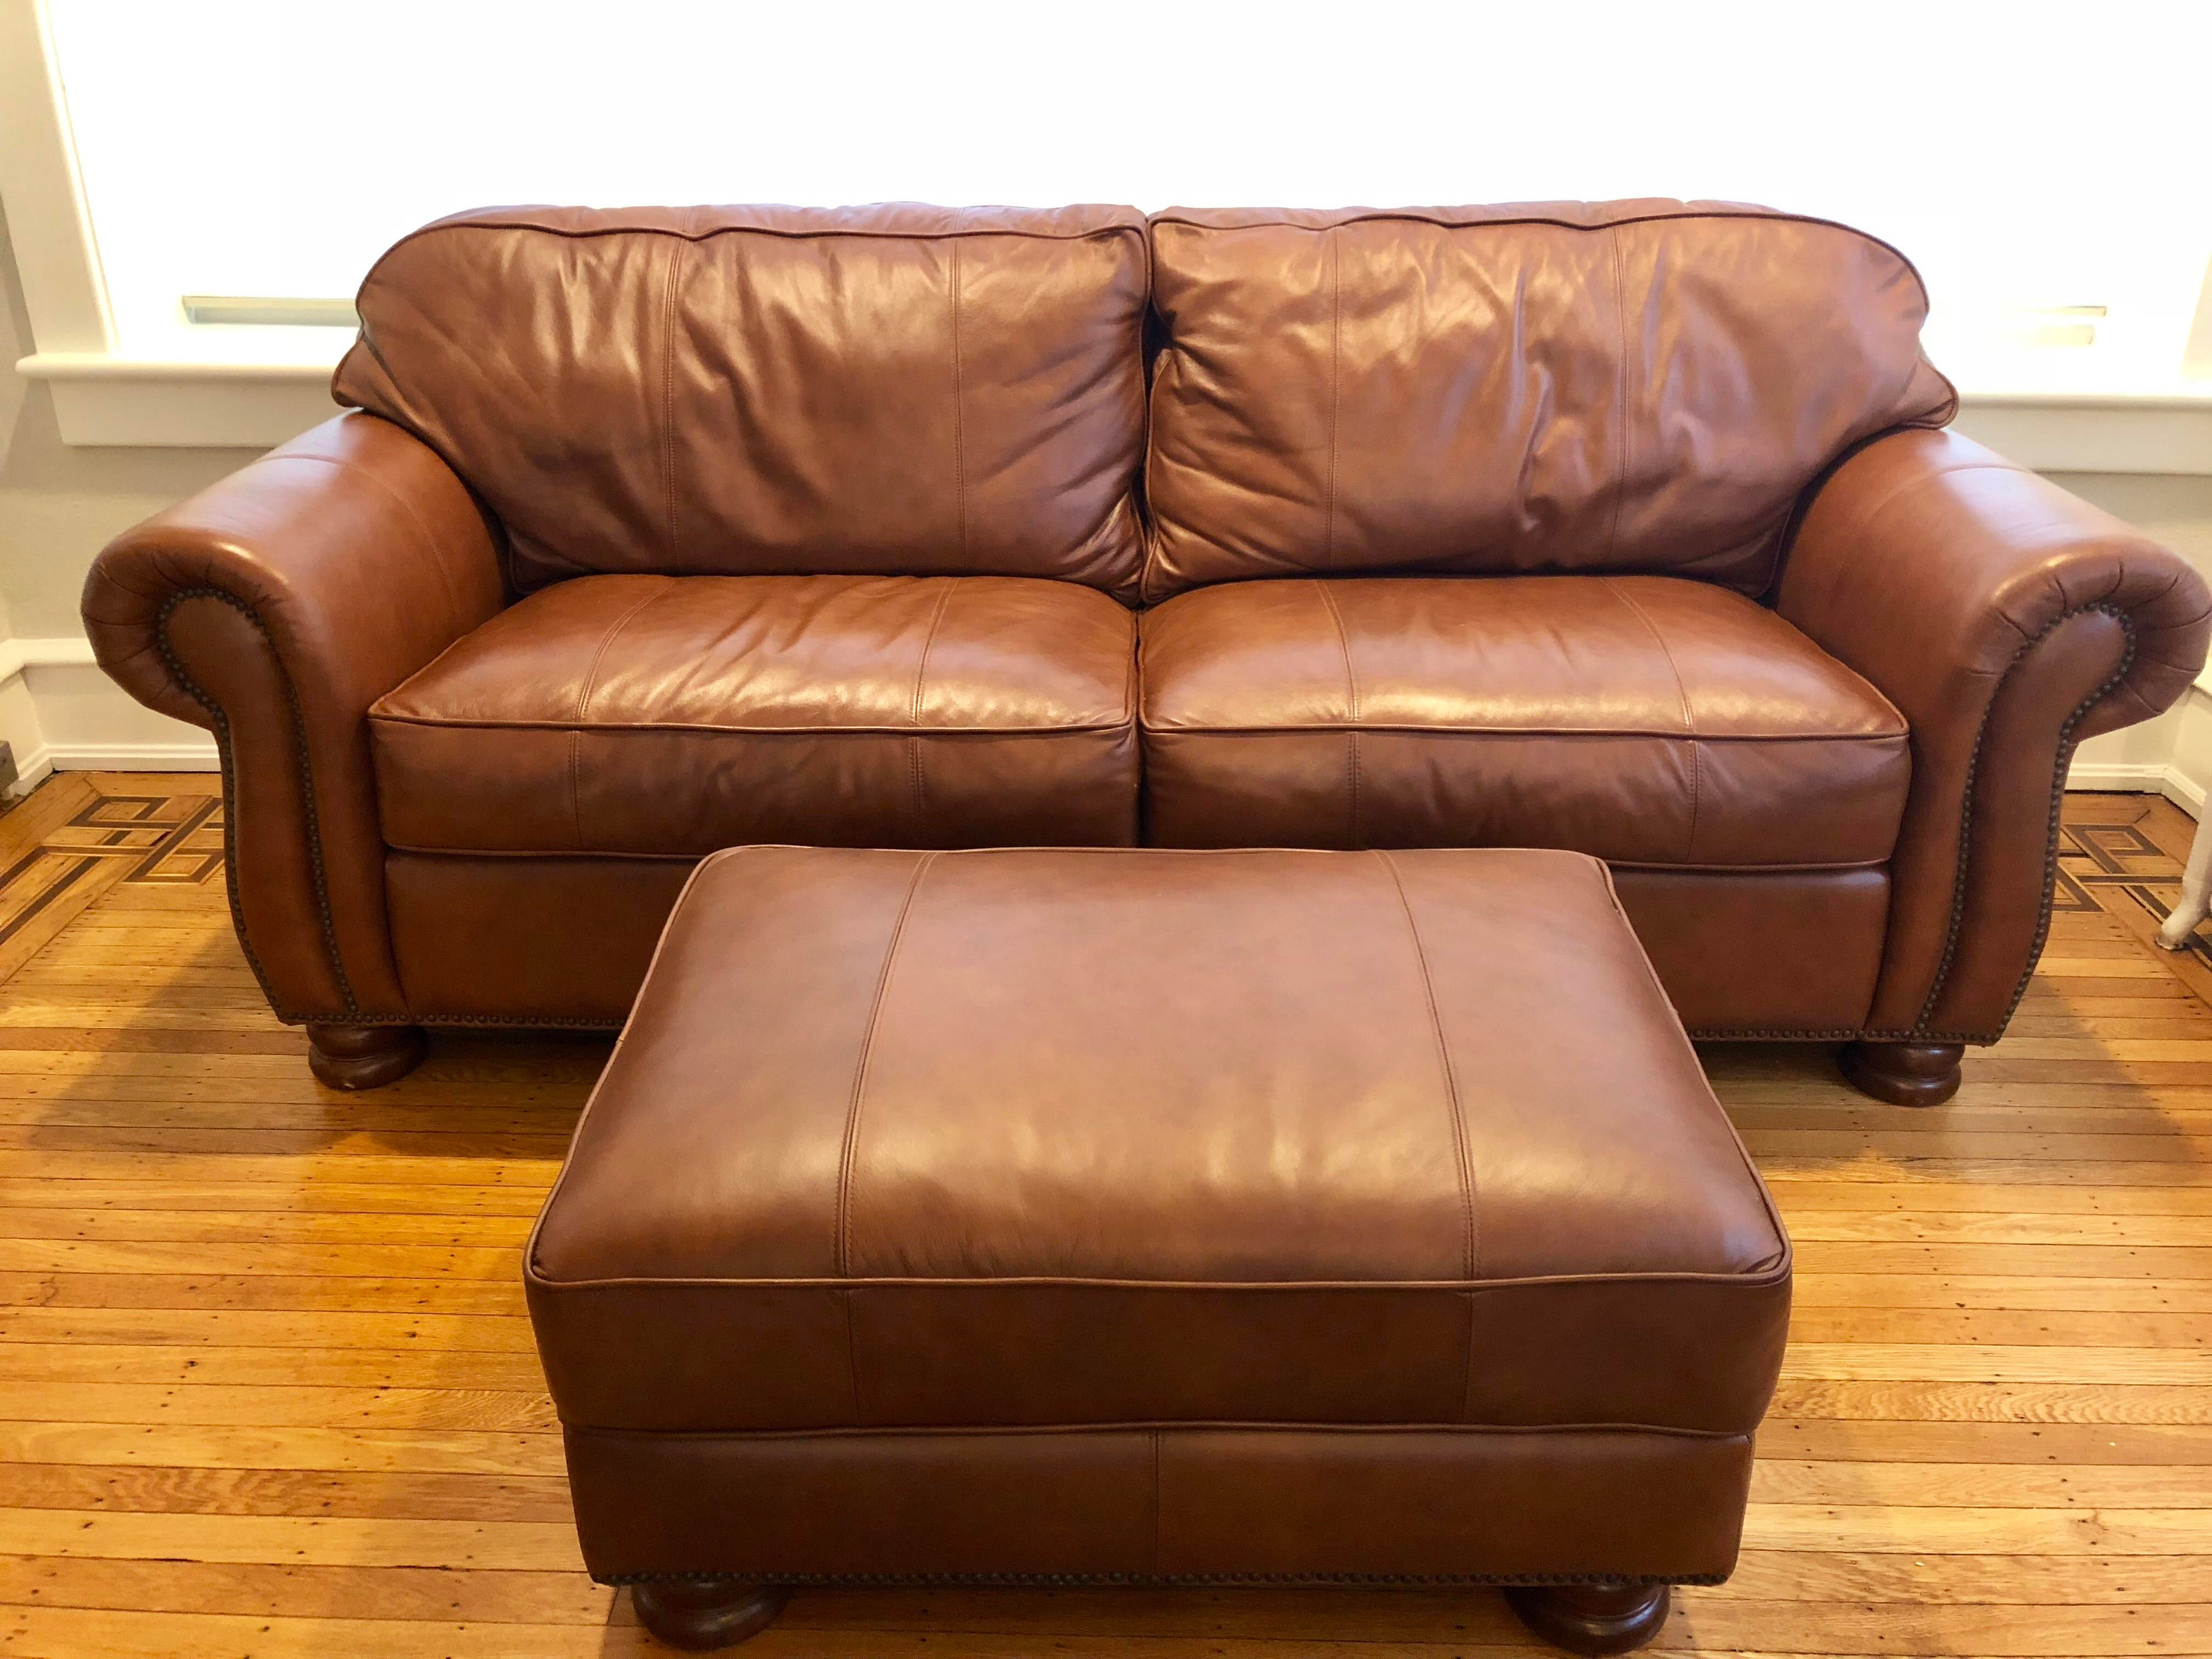 Thomasville Benjamin Brown Leather Sofa U0026 Ottoman   Image 6 ...